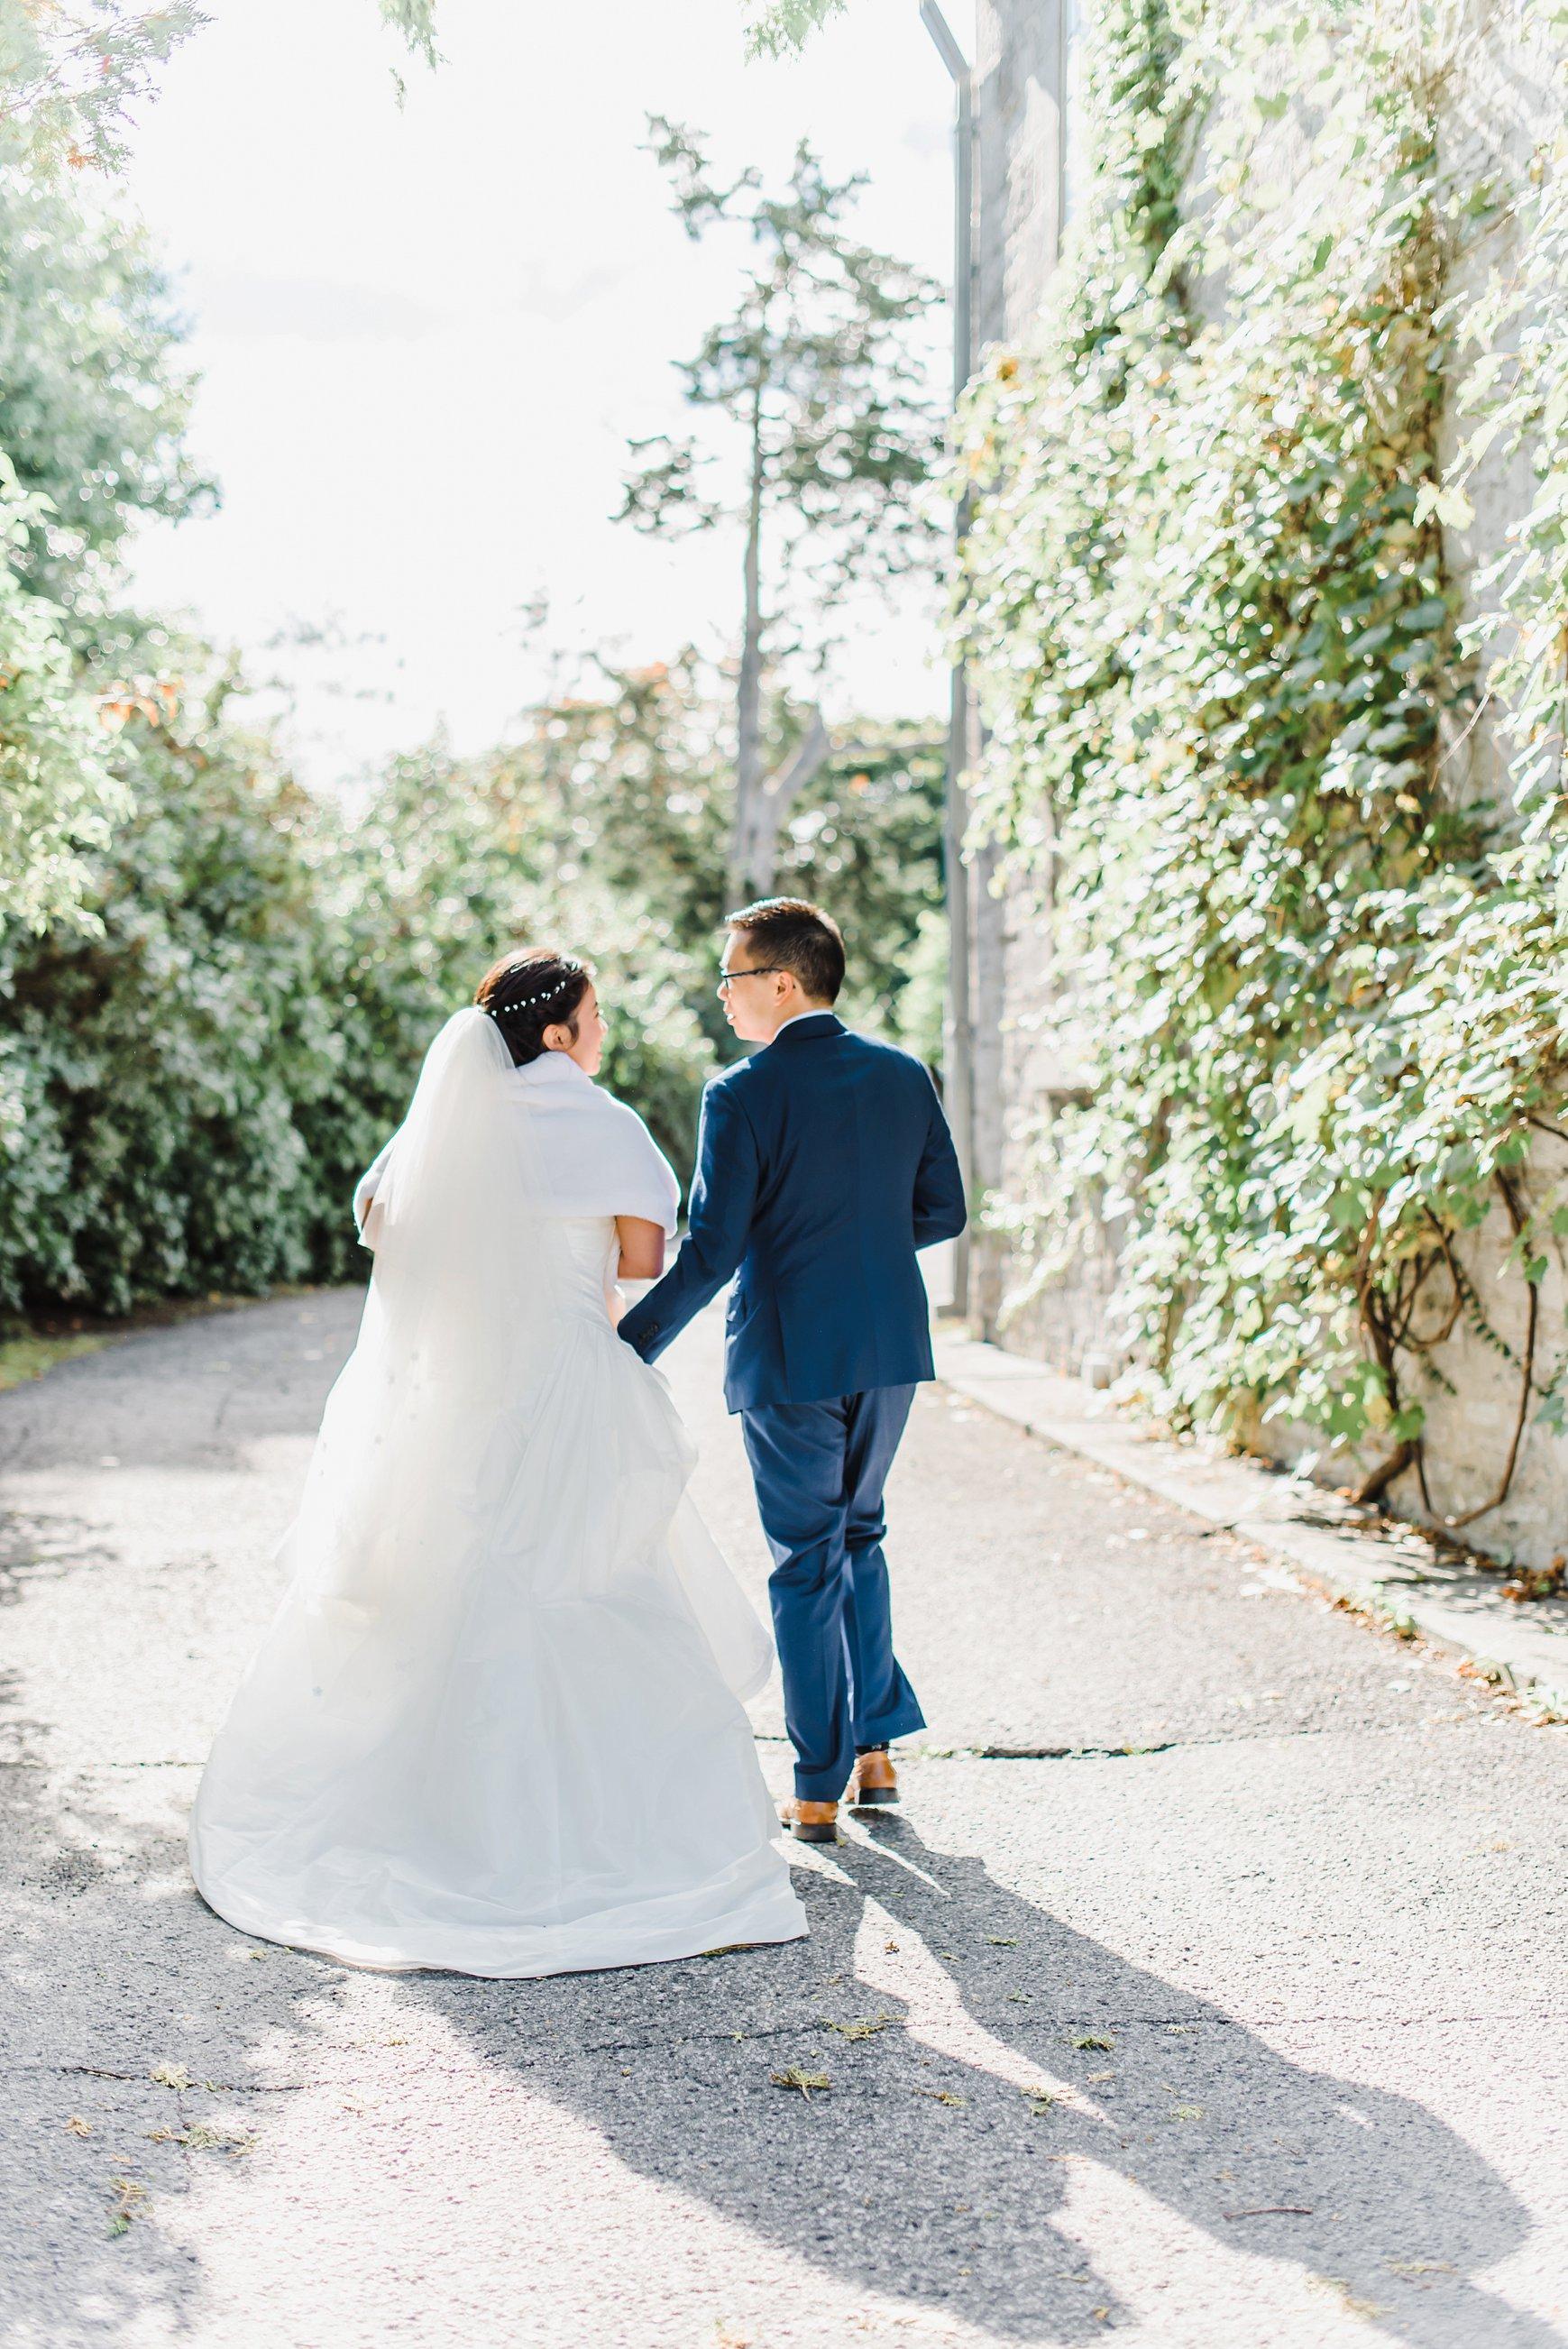 light airy indie fine art ottawa wedding photographer | Ali and Batoul Photography_1482.jpg